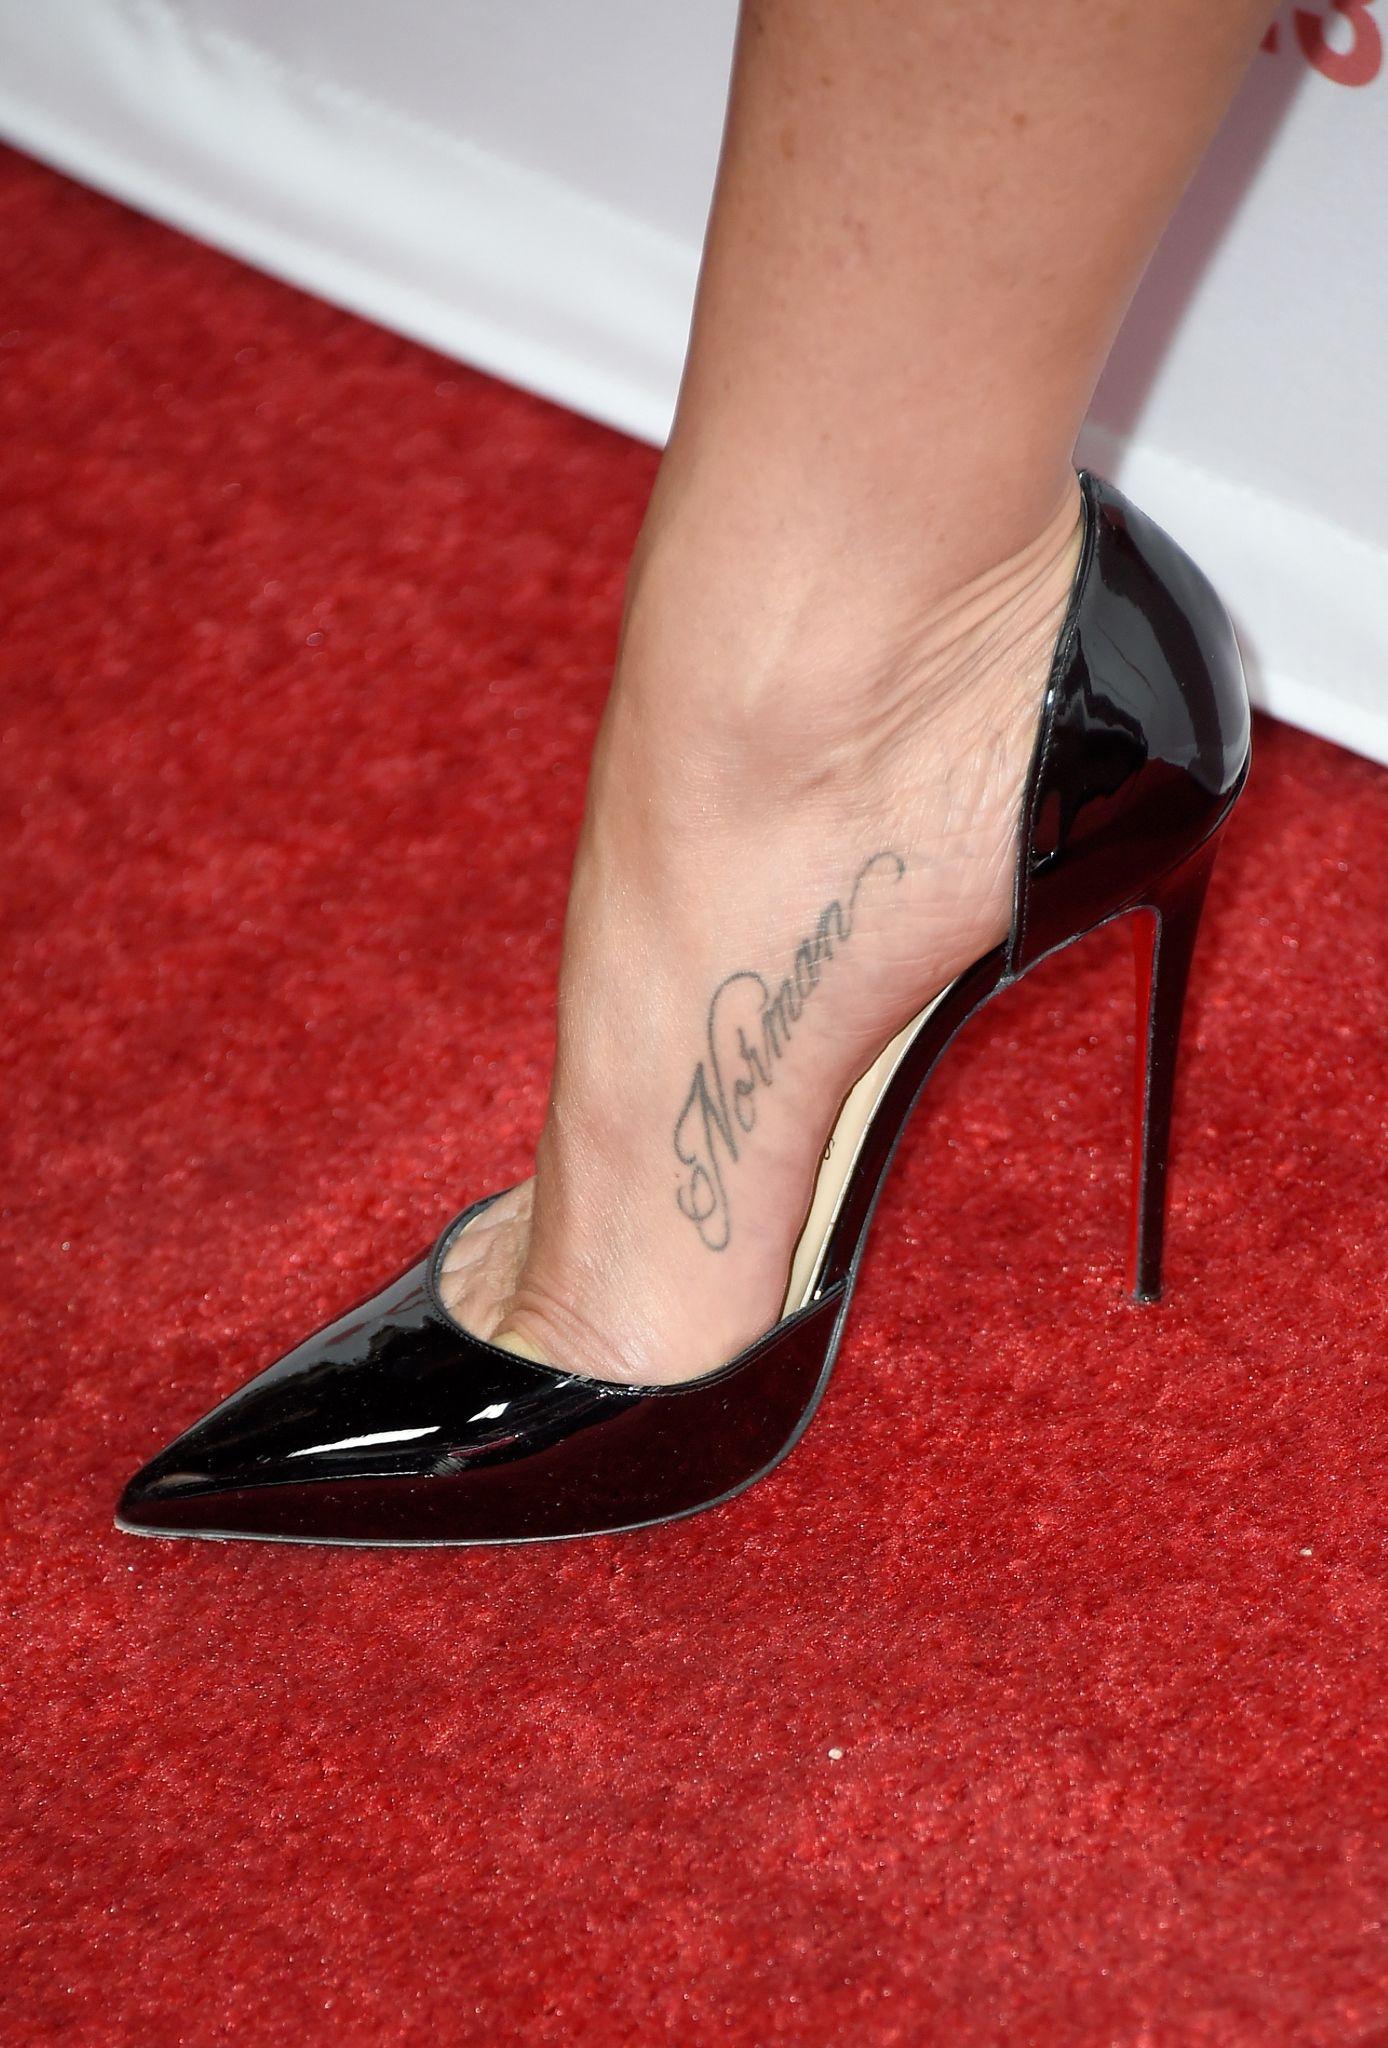 Tattoo AnistonPatLthIn Tattoo 2019 2019 AnistonPatLthIn Jennifer Tattoo AnistonPatLthIn Jennifer AnistonPatLthIn Jennifer 2019 Jennifer xoCWrdBe